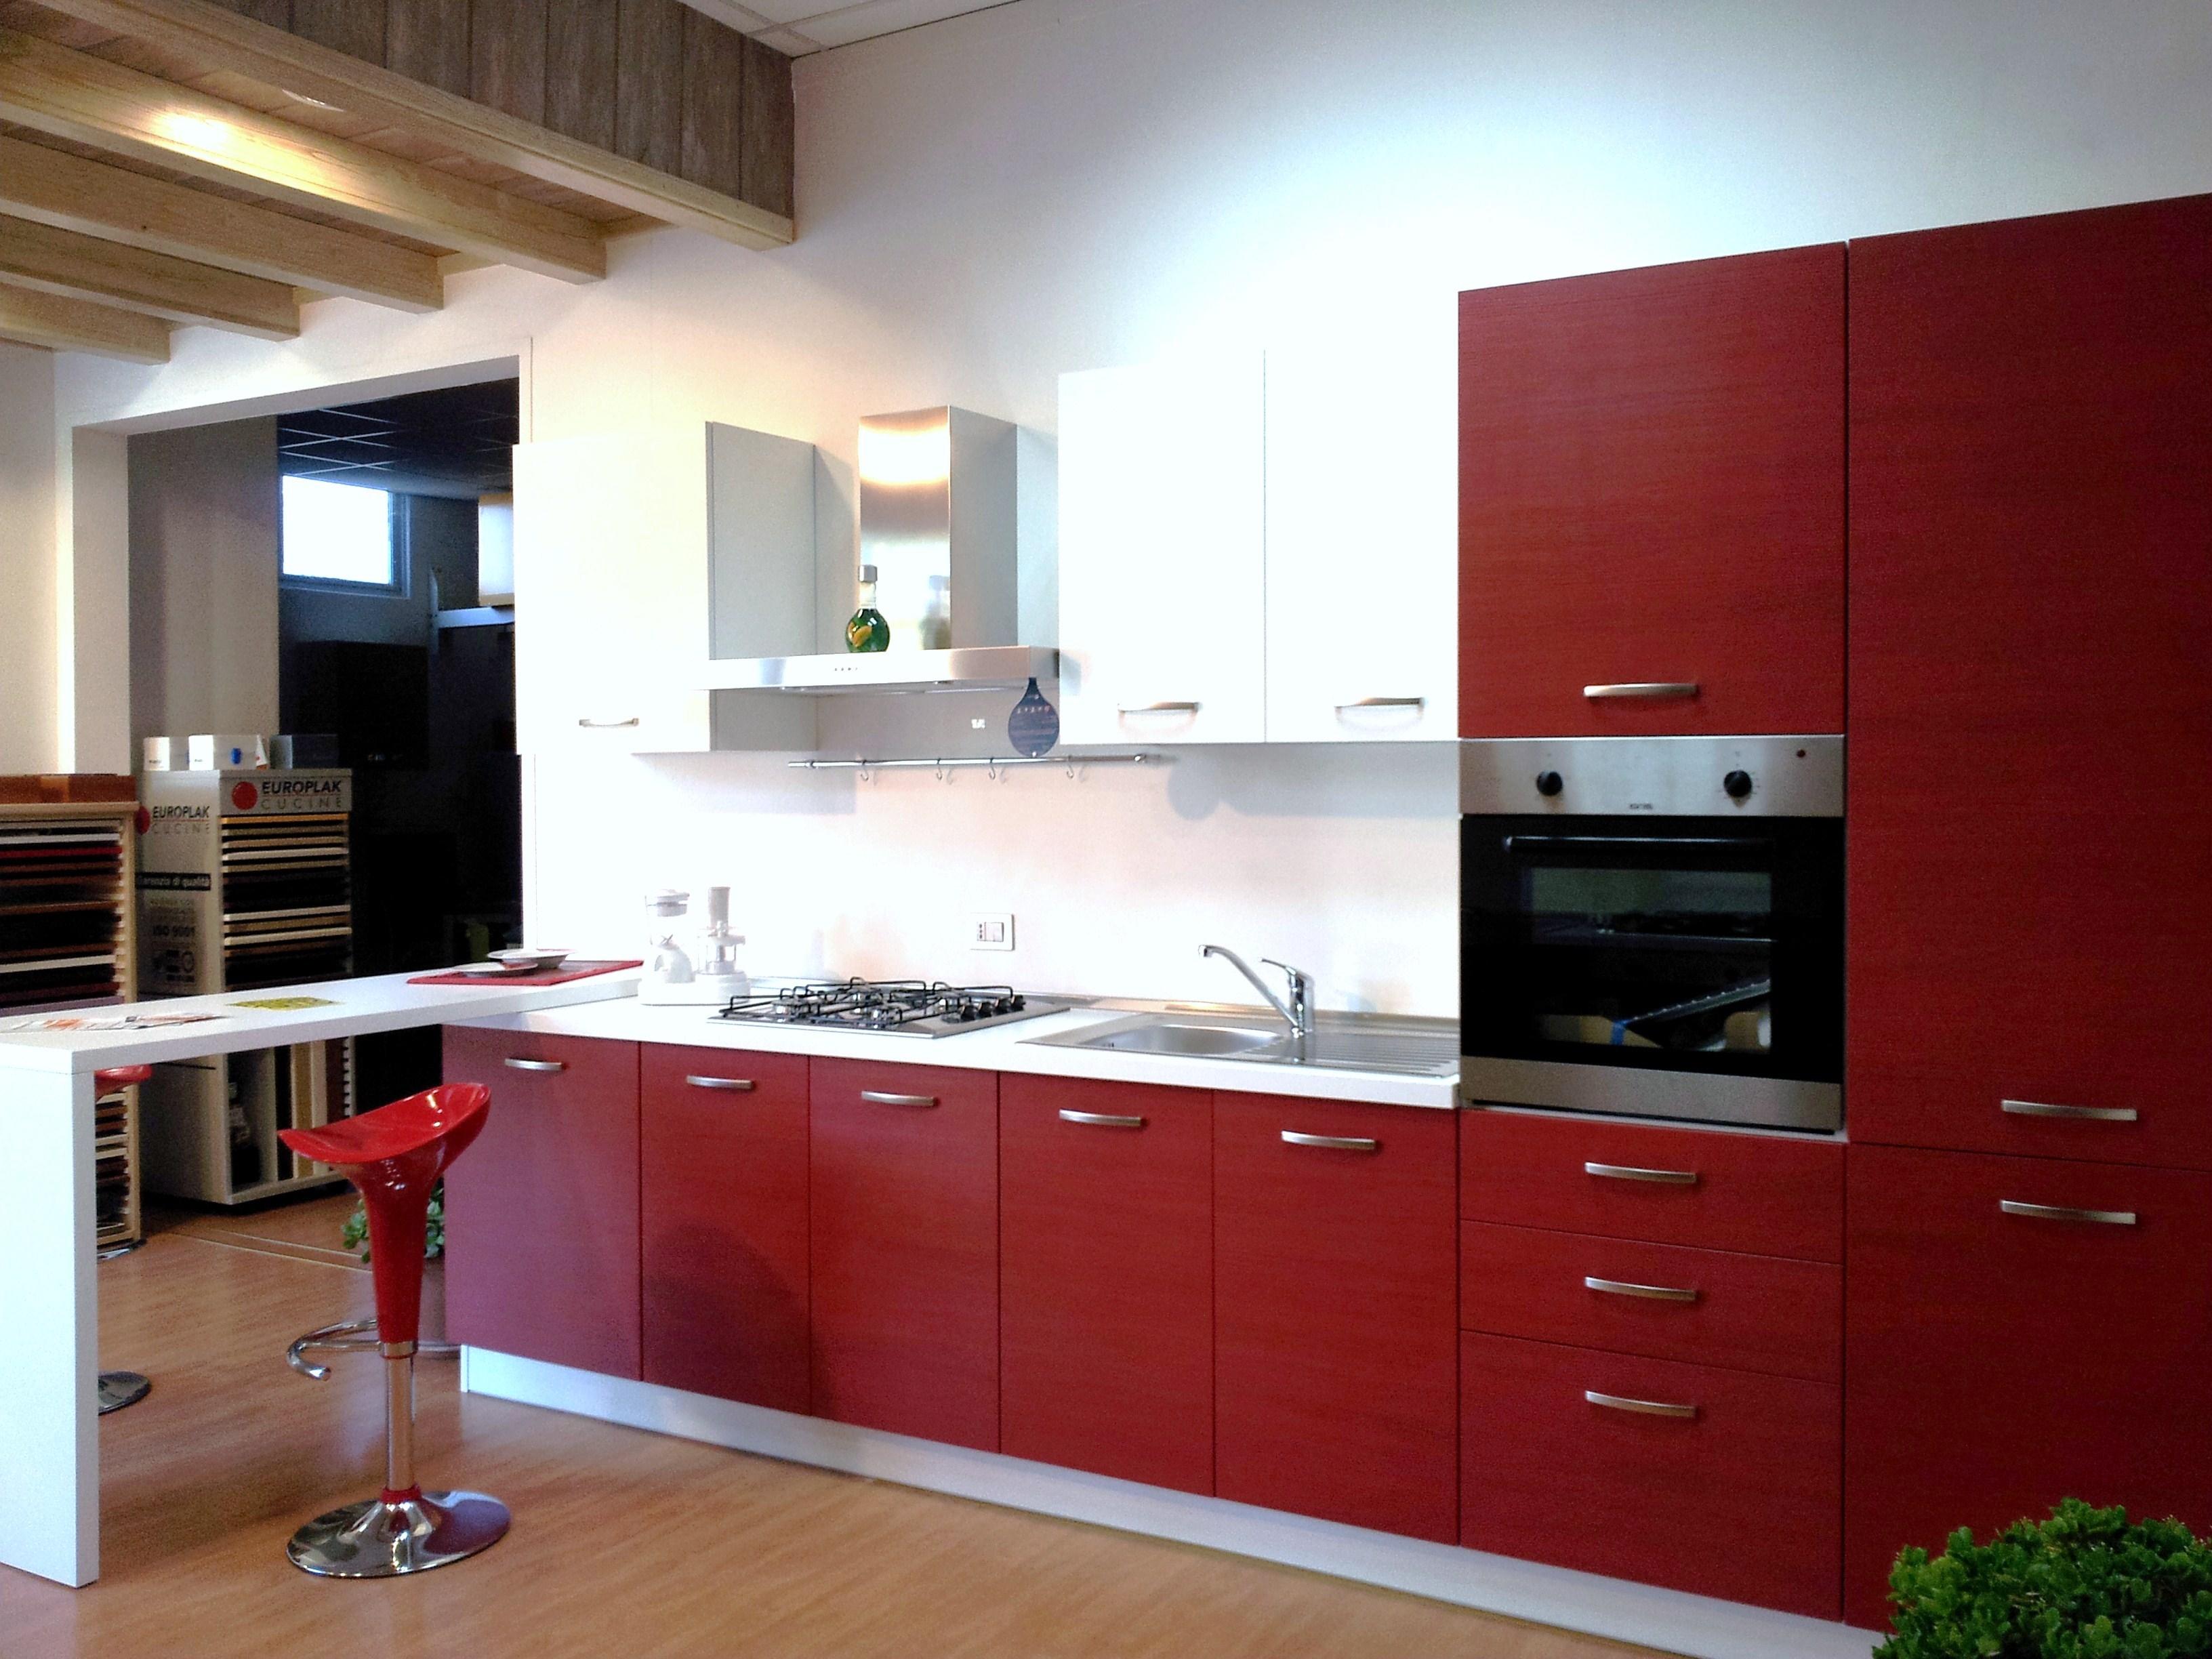 Cucine a penisola isola cucina with cucine a penisola - Cucine con penisola ...